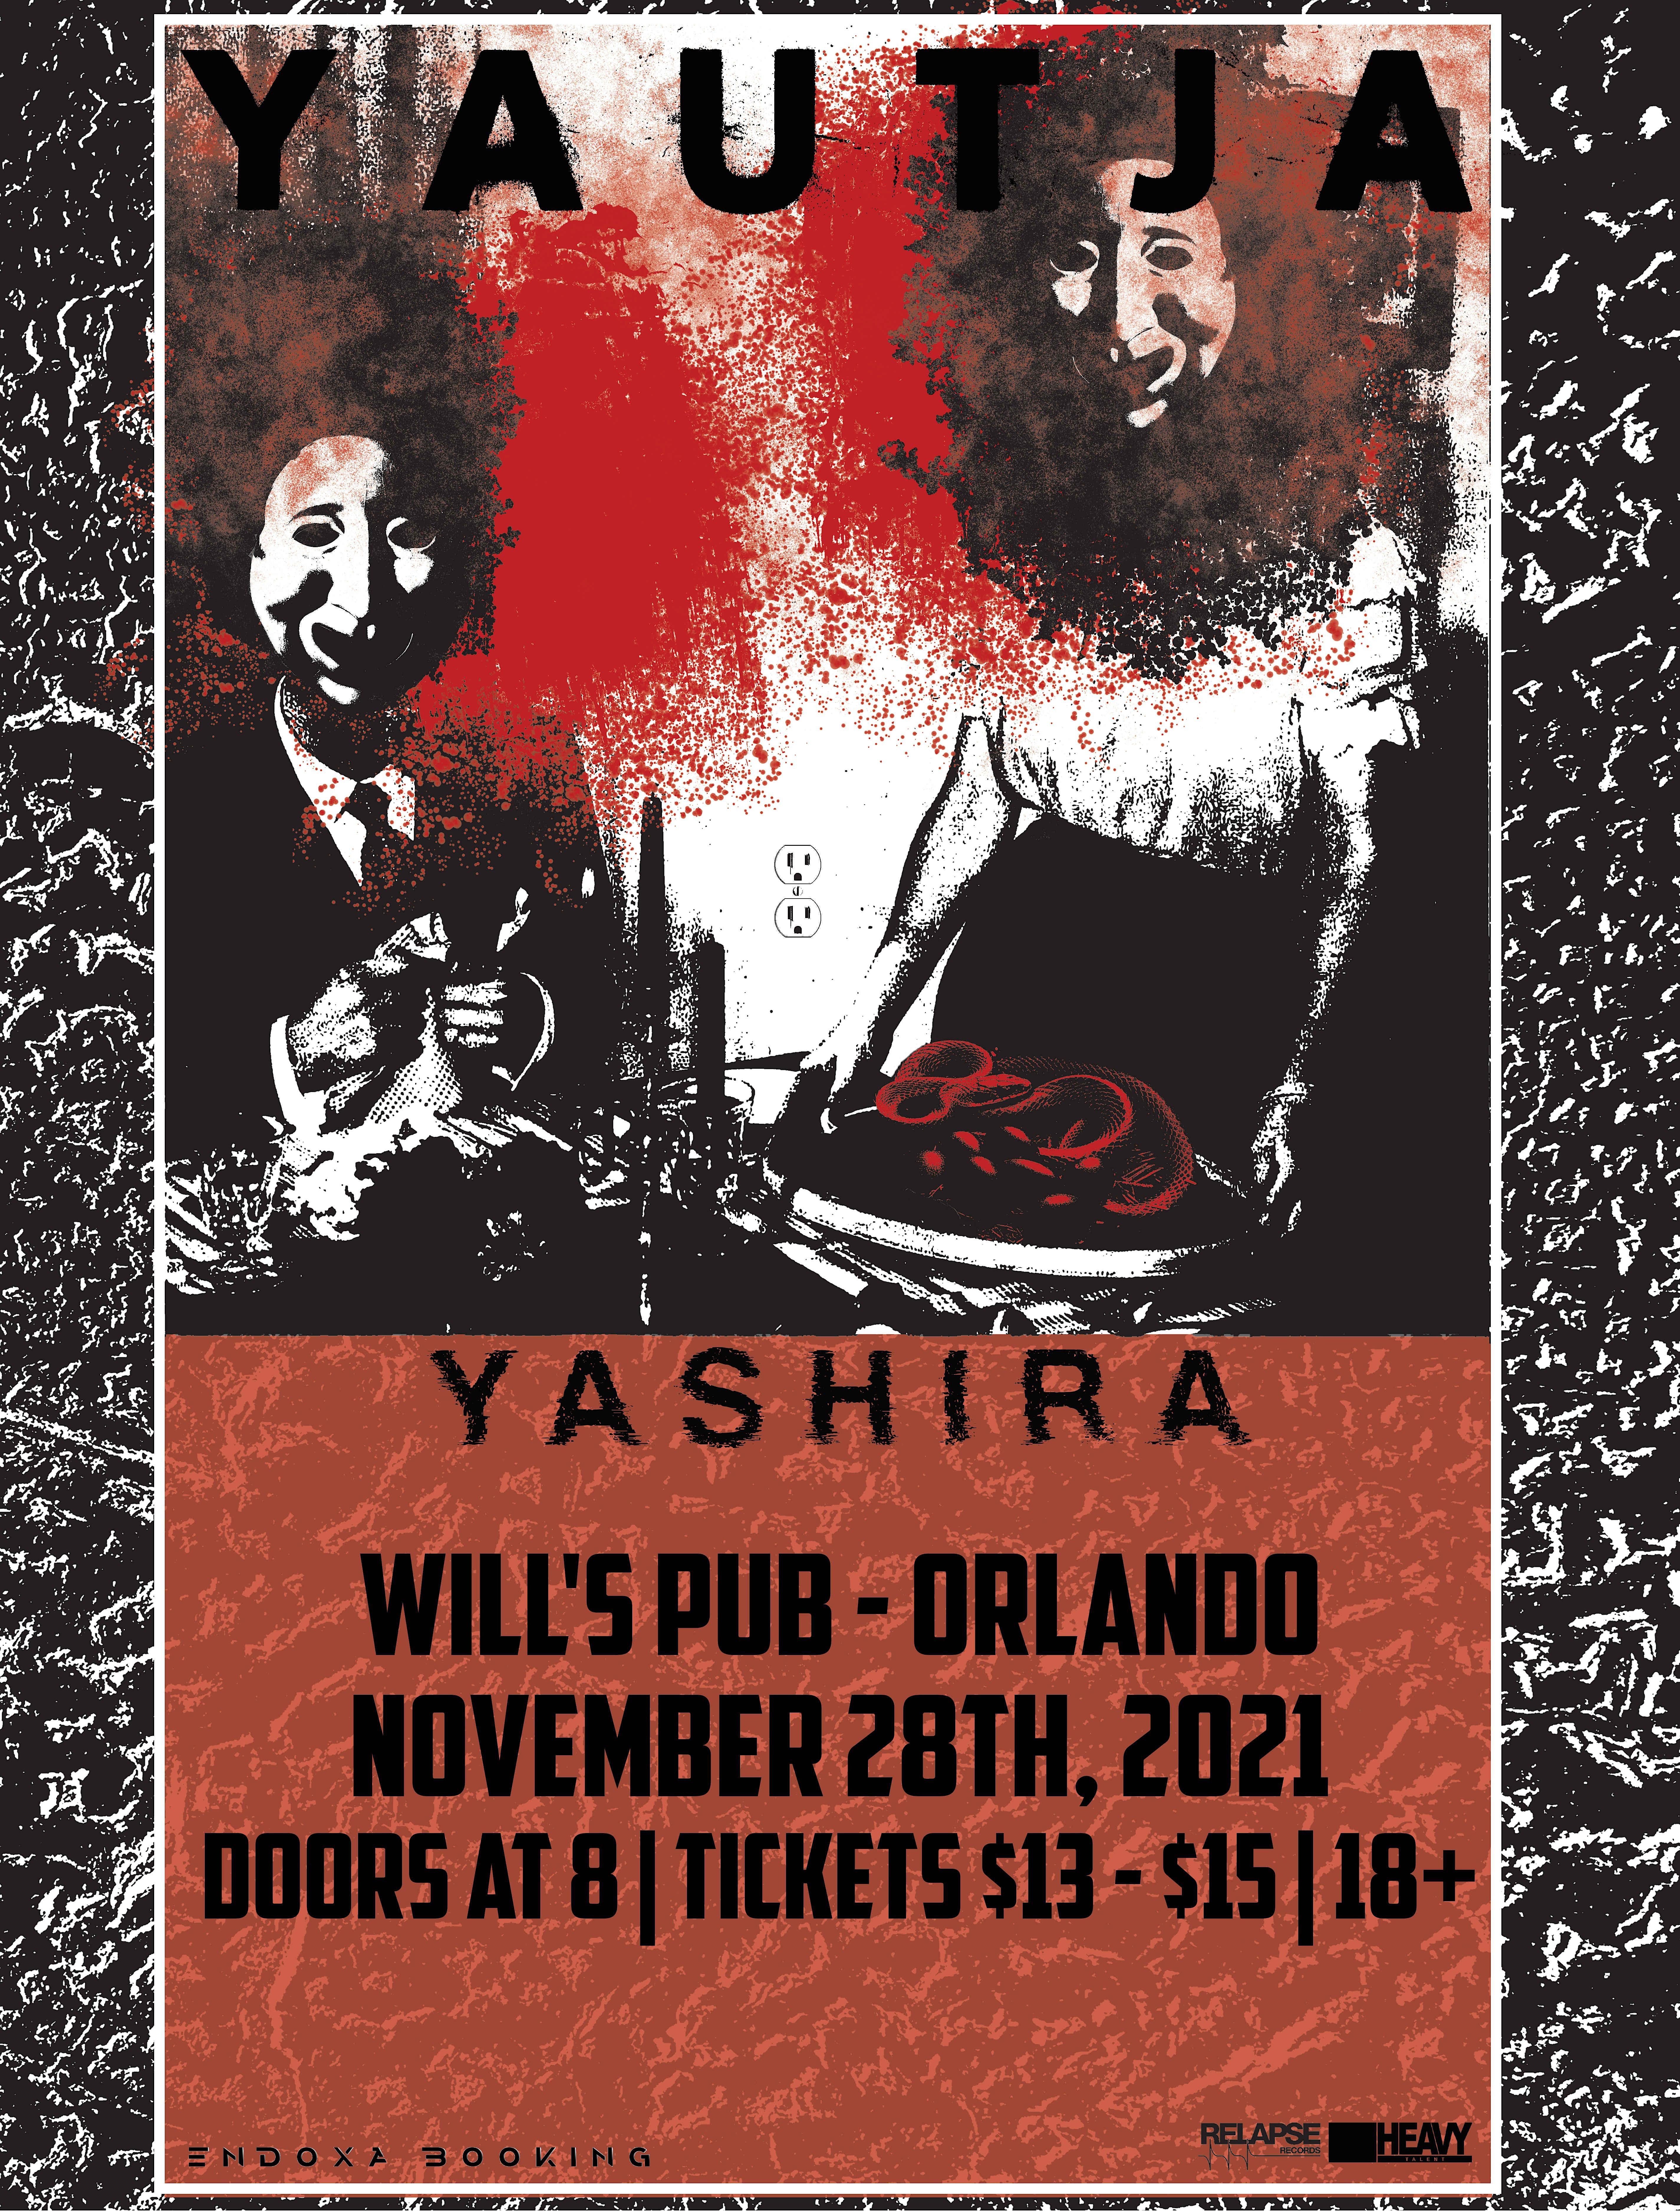 Yautja, Yashira, and more at Will's Pub